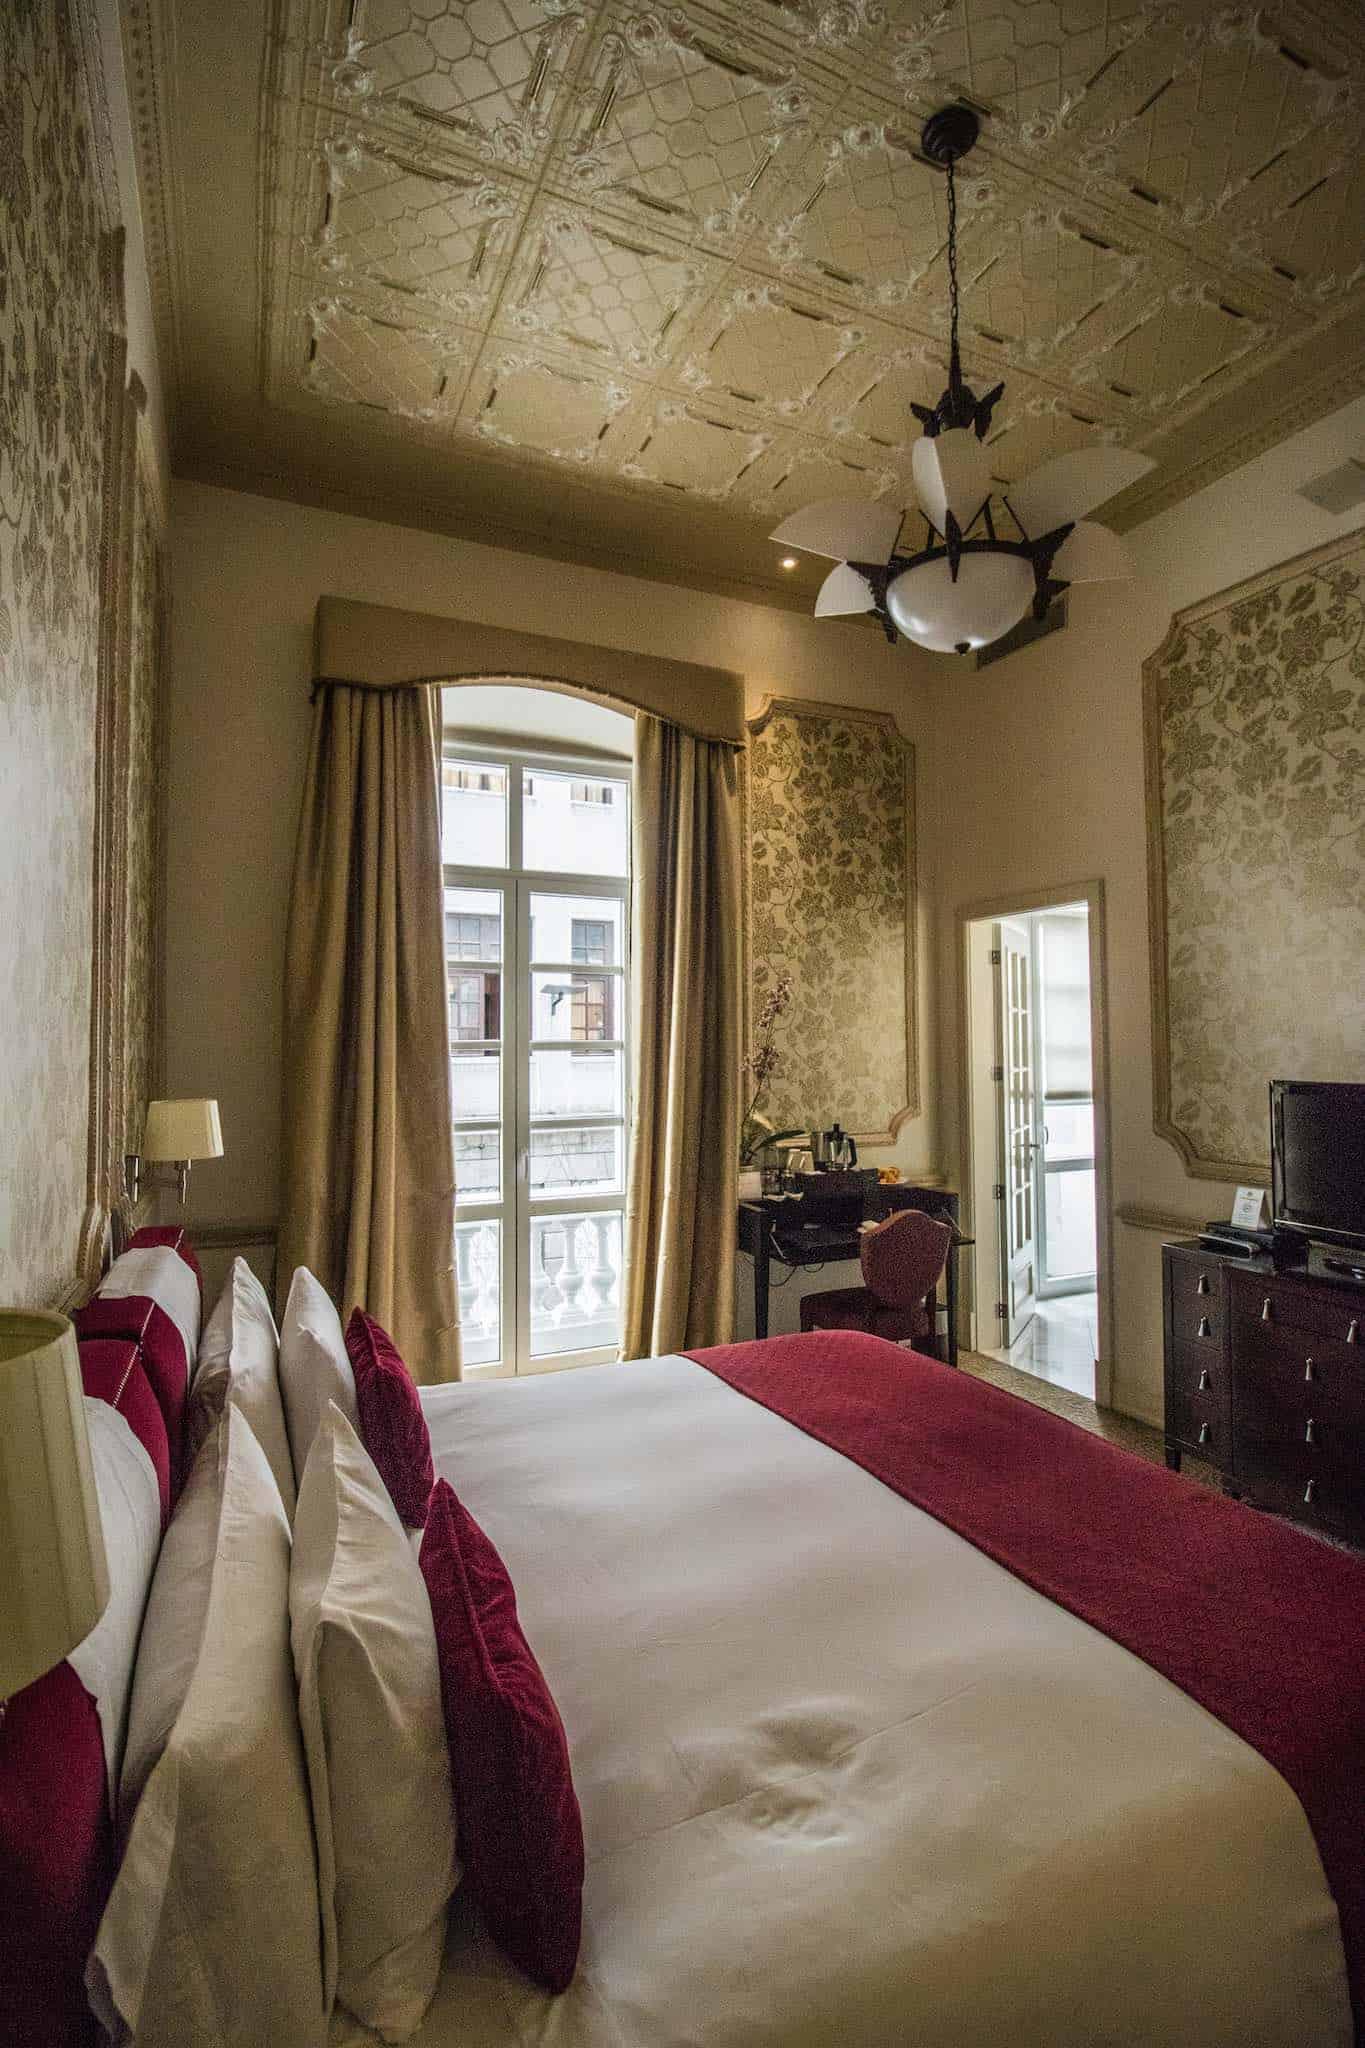 Quito - Casa Gangotena - Bedroom